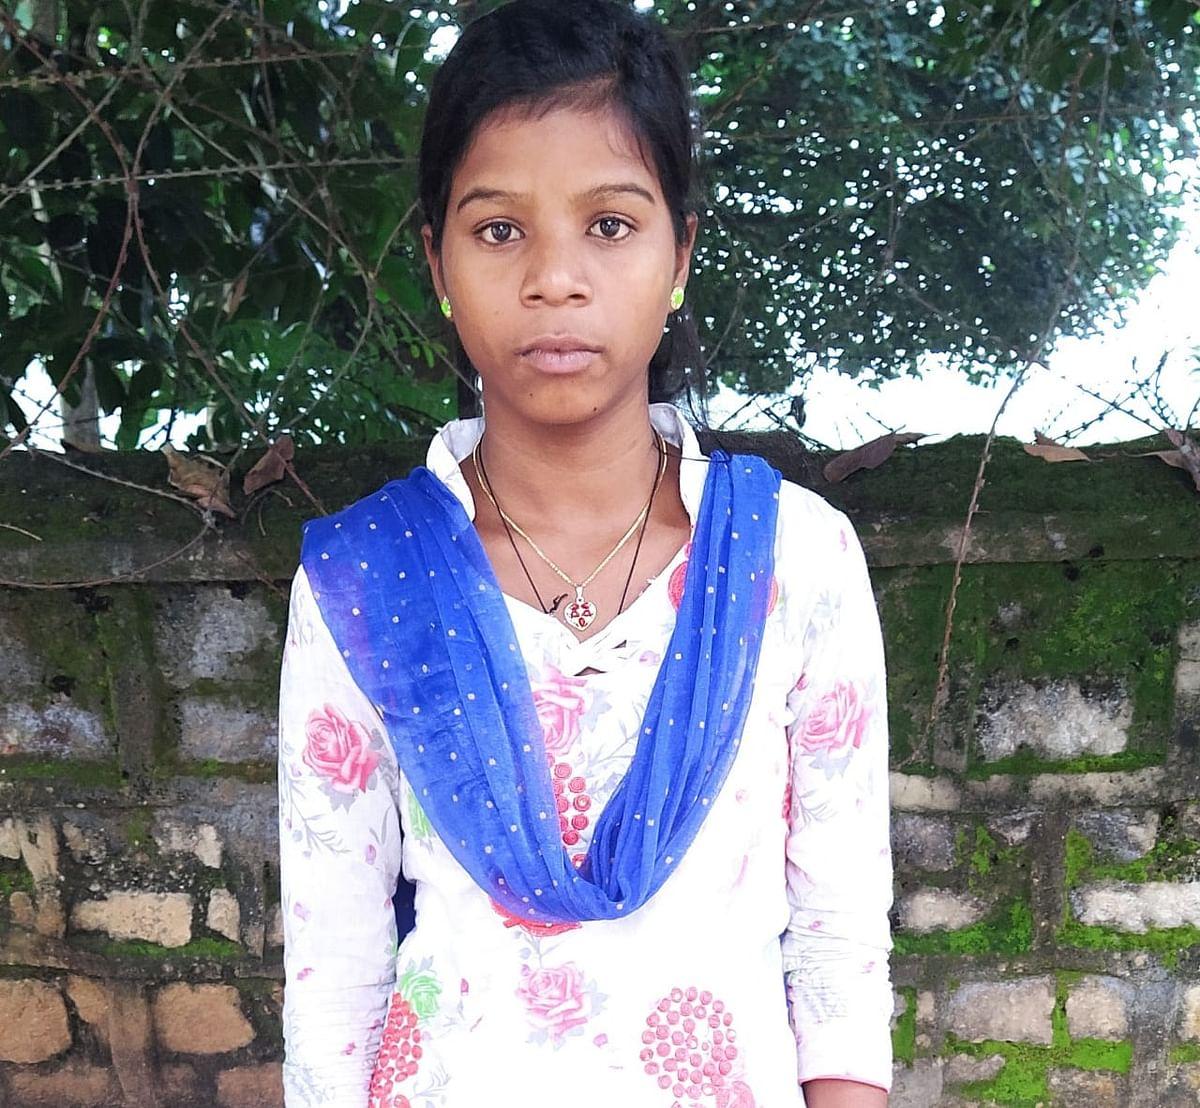 गुजरात से रेस्क्यू कर रांची लायी गयी 20 लड़कियां , एक गिरफ्तार